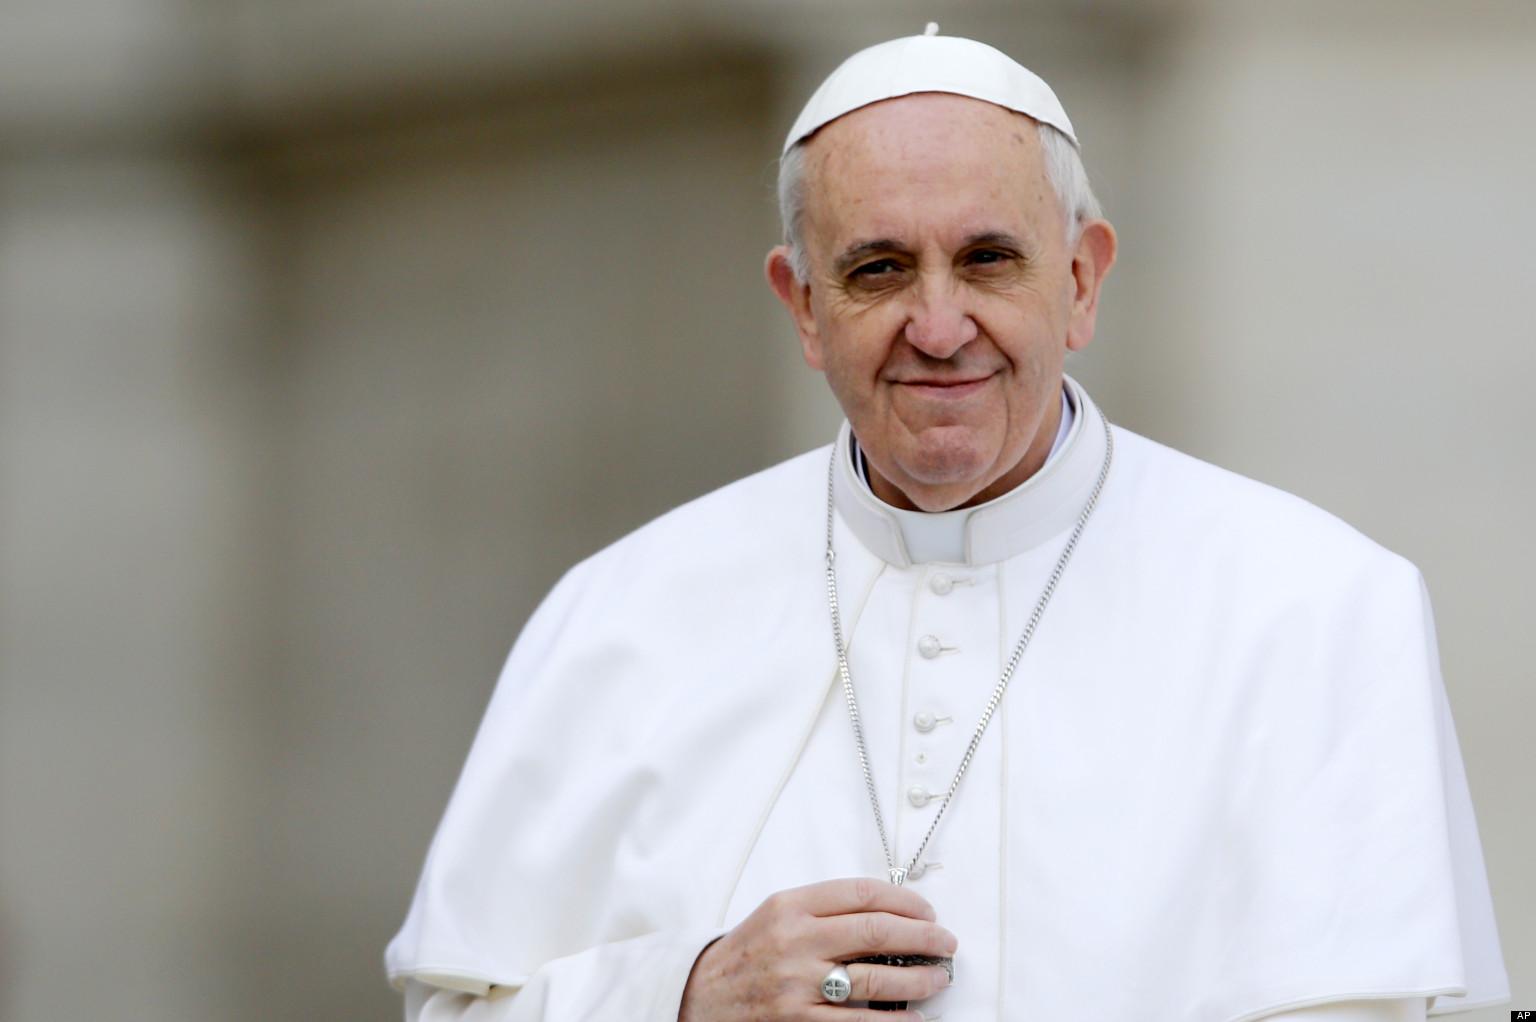 Oficial: Papa Francisc vine în România